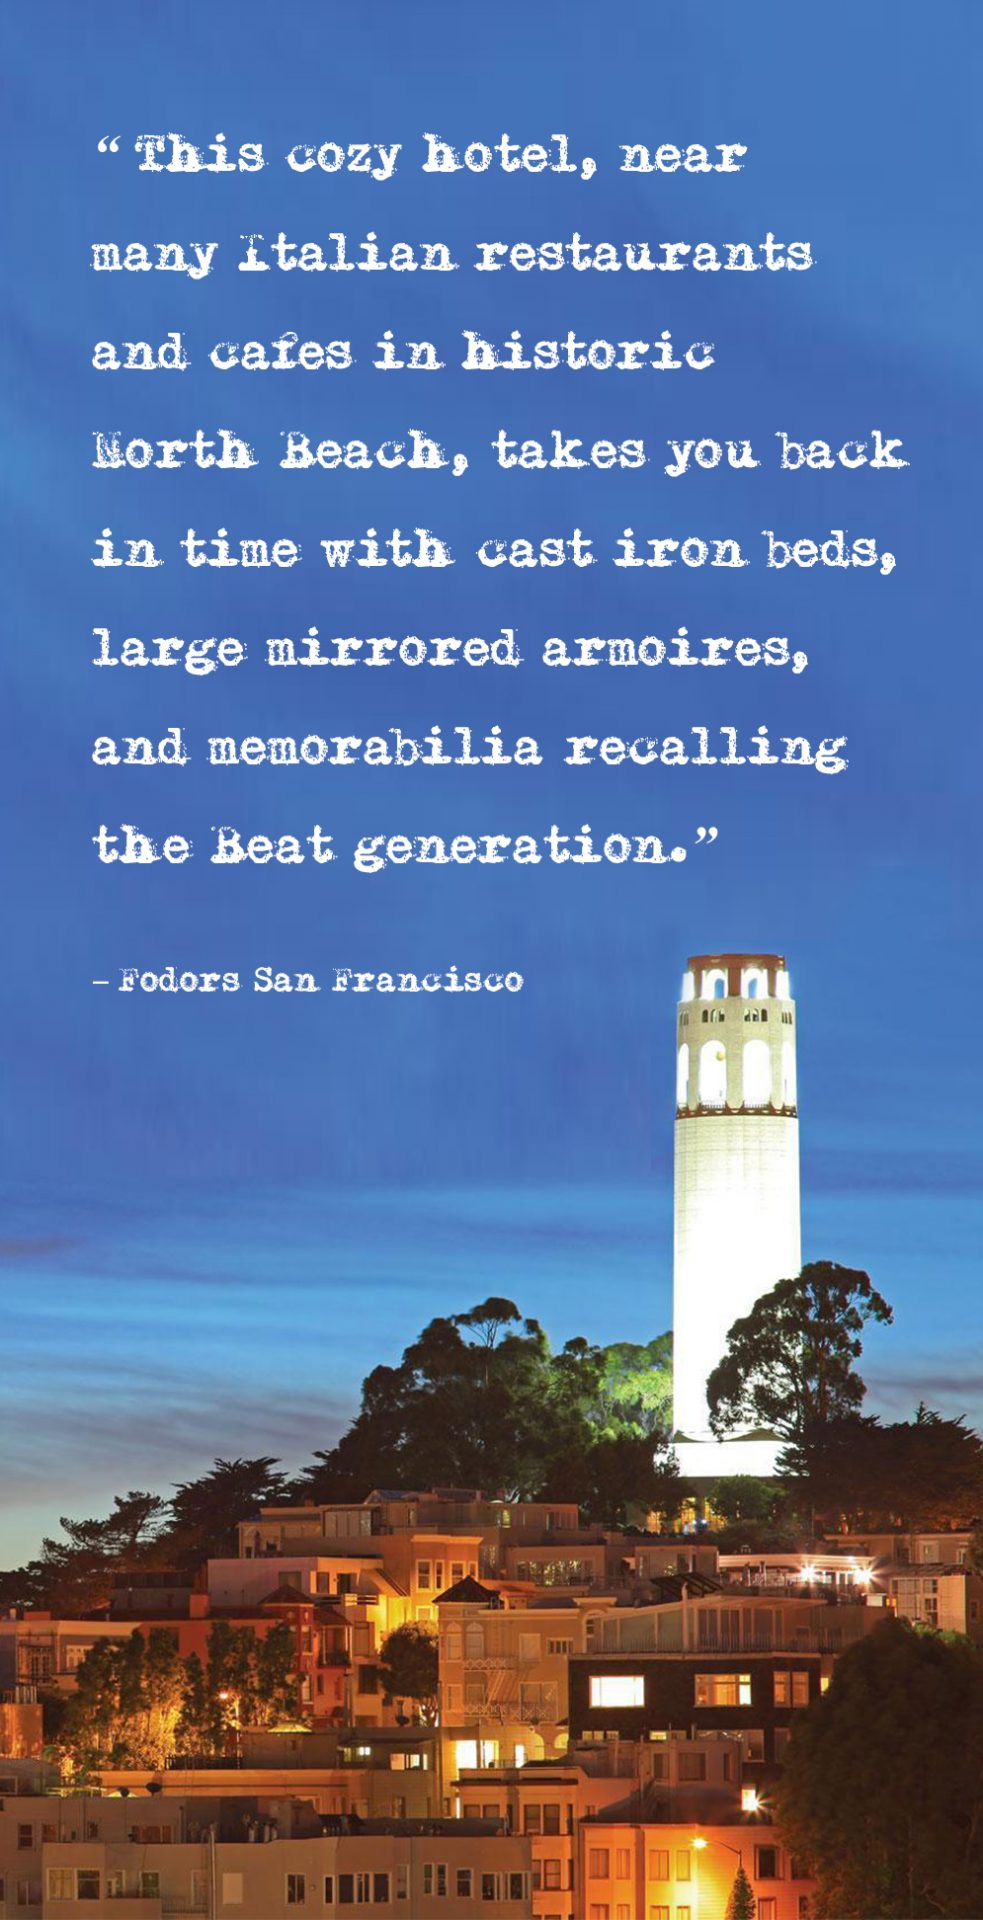 Coit Tower / FODORS, San Francisco